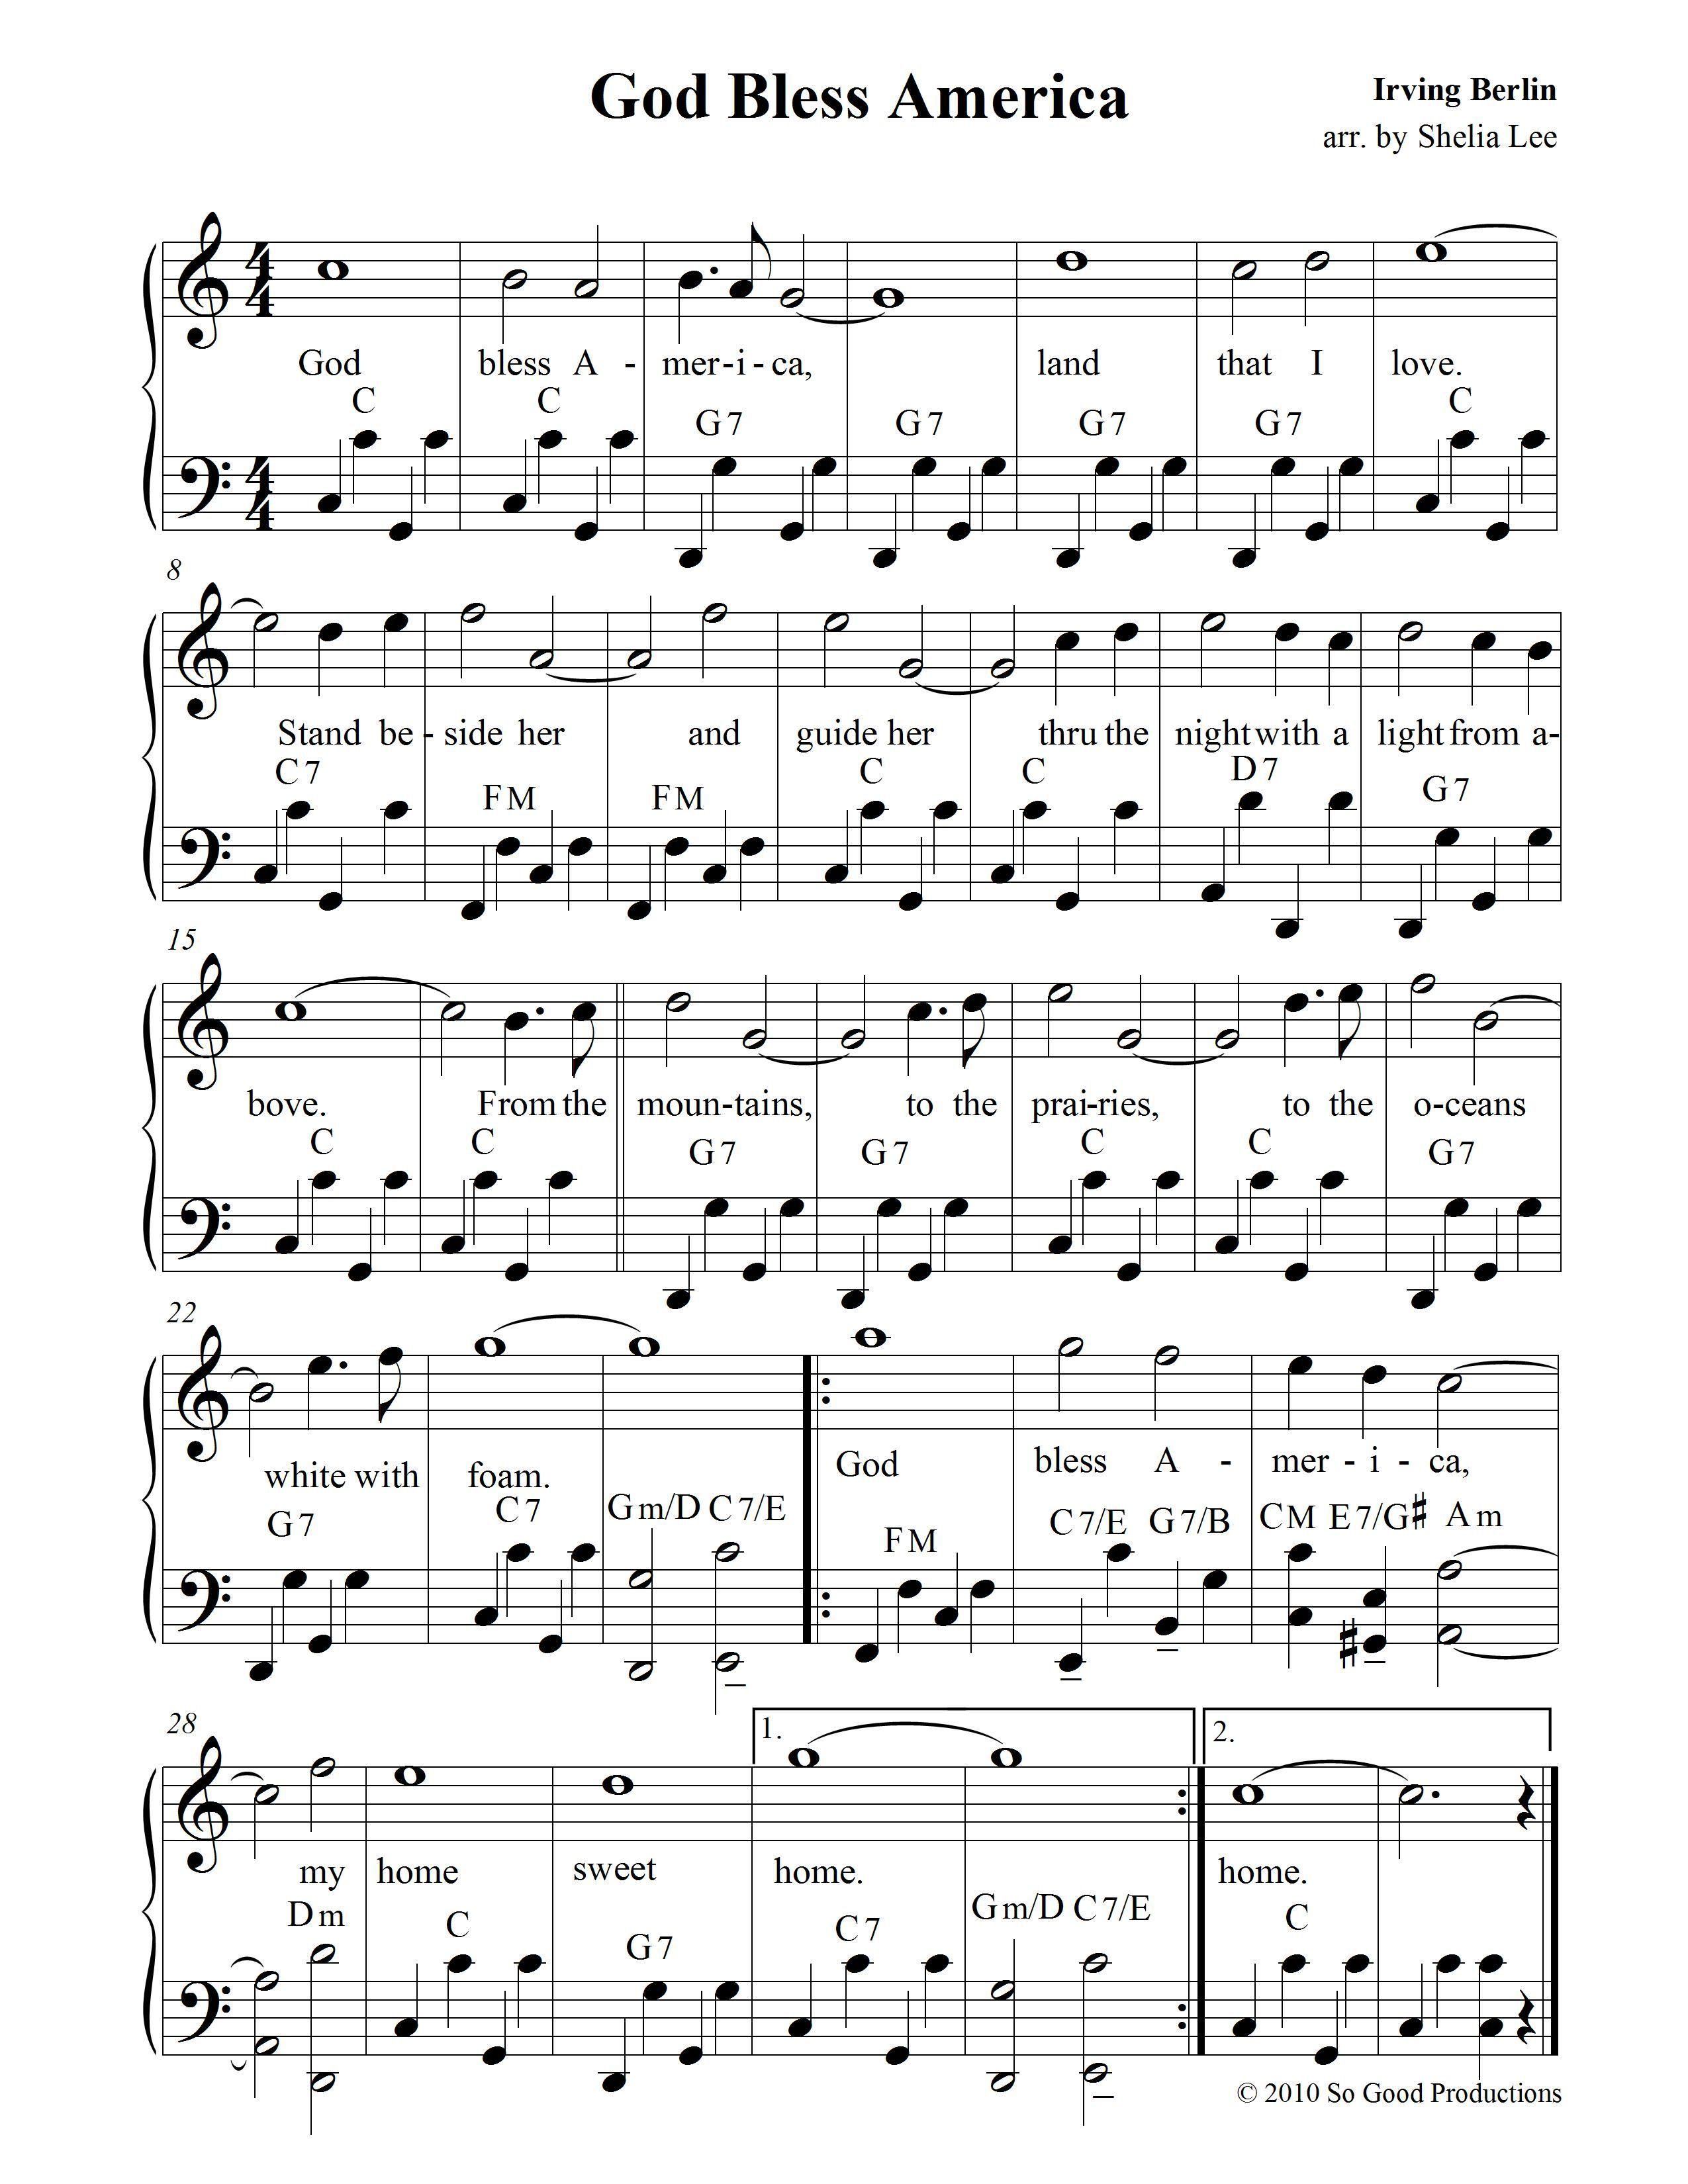 God Bless America Sheet Music Free